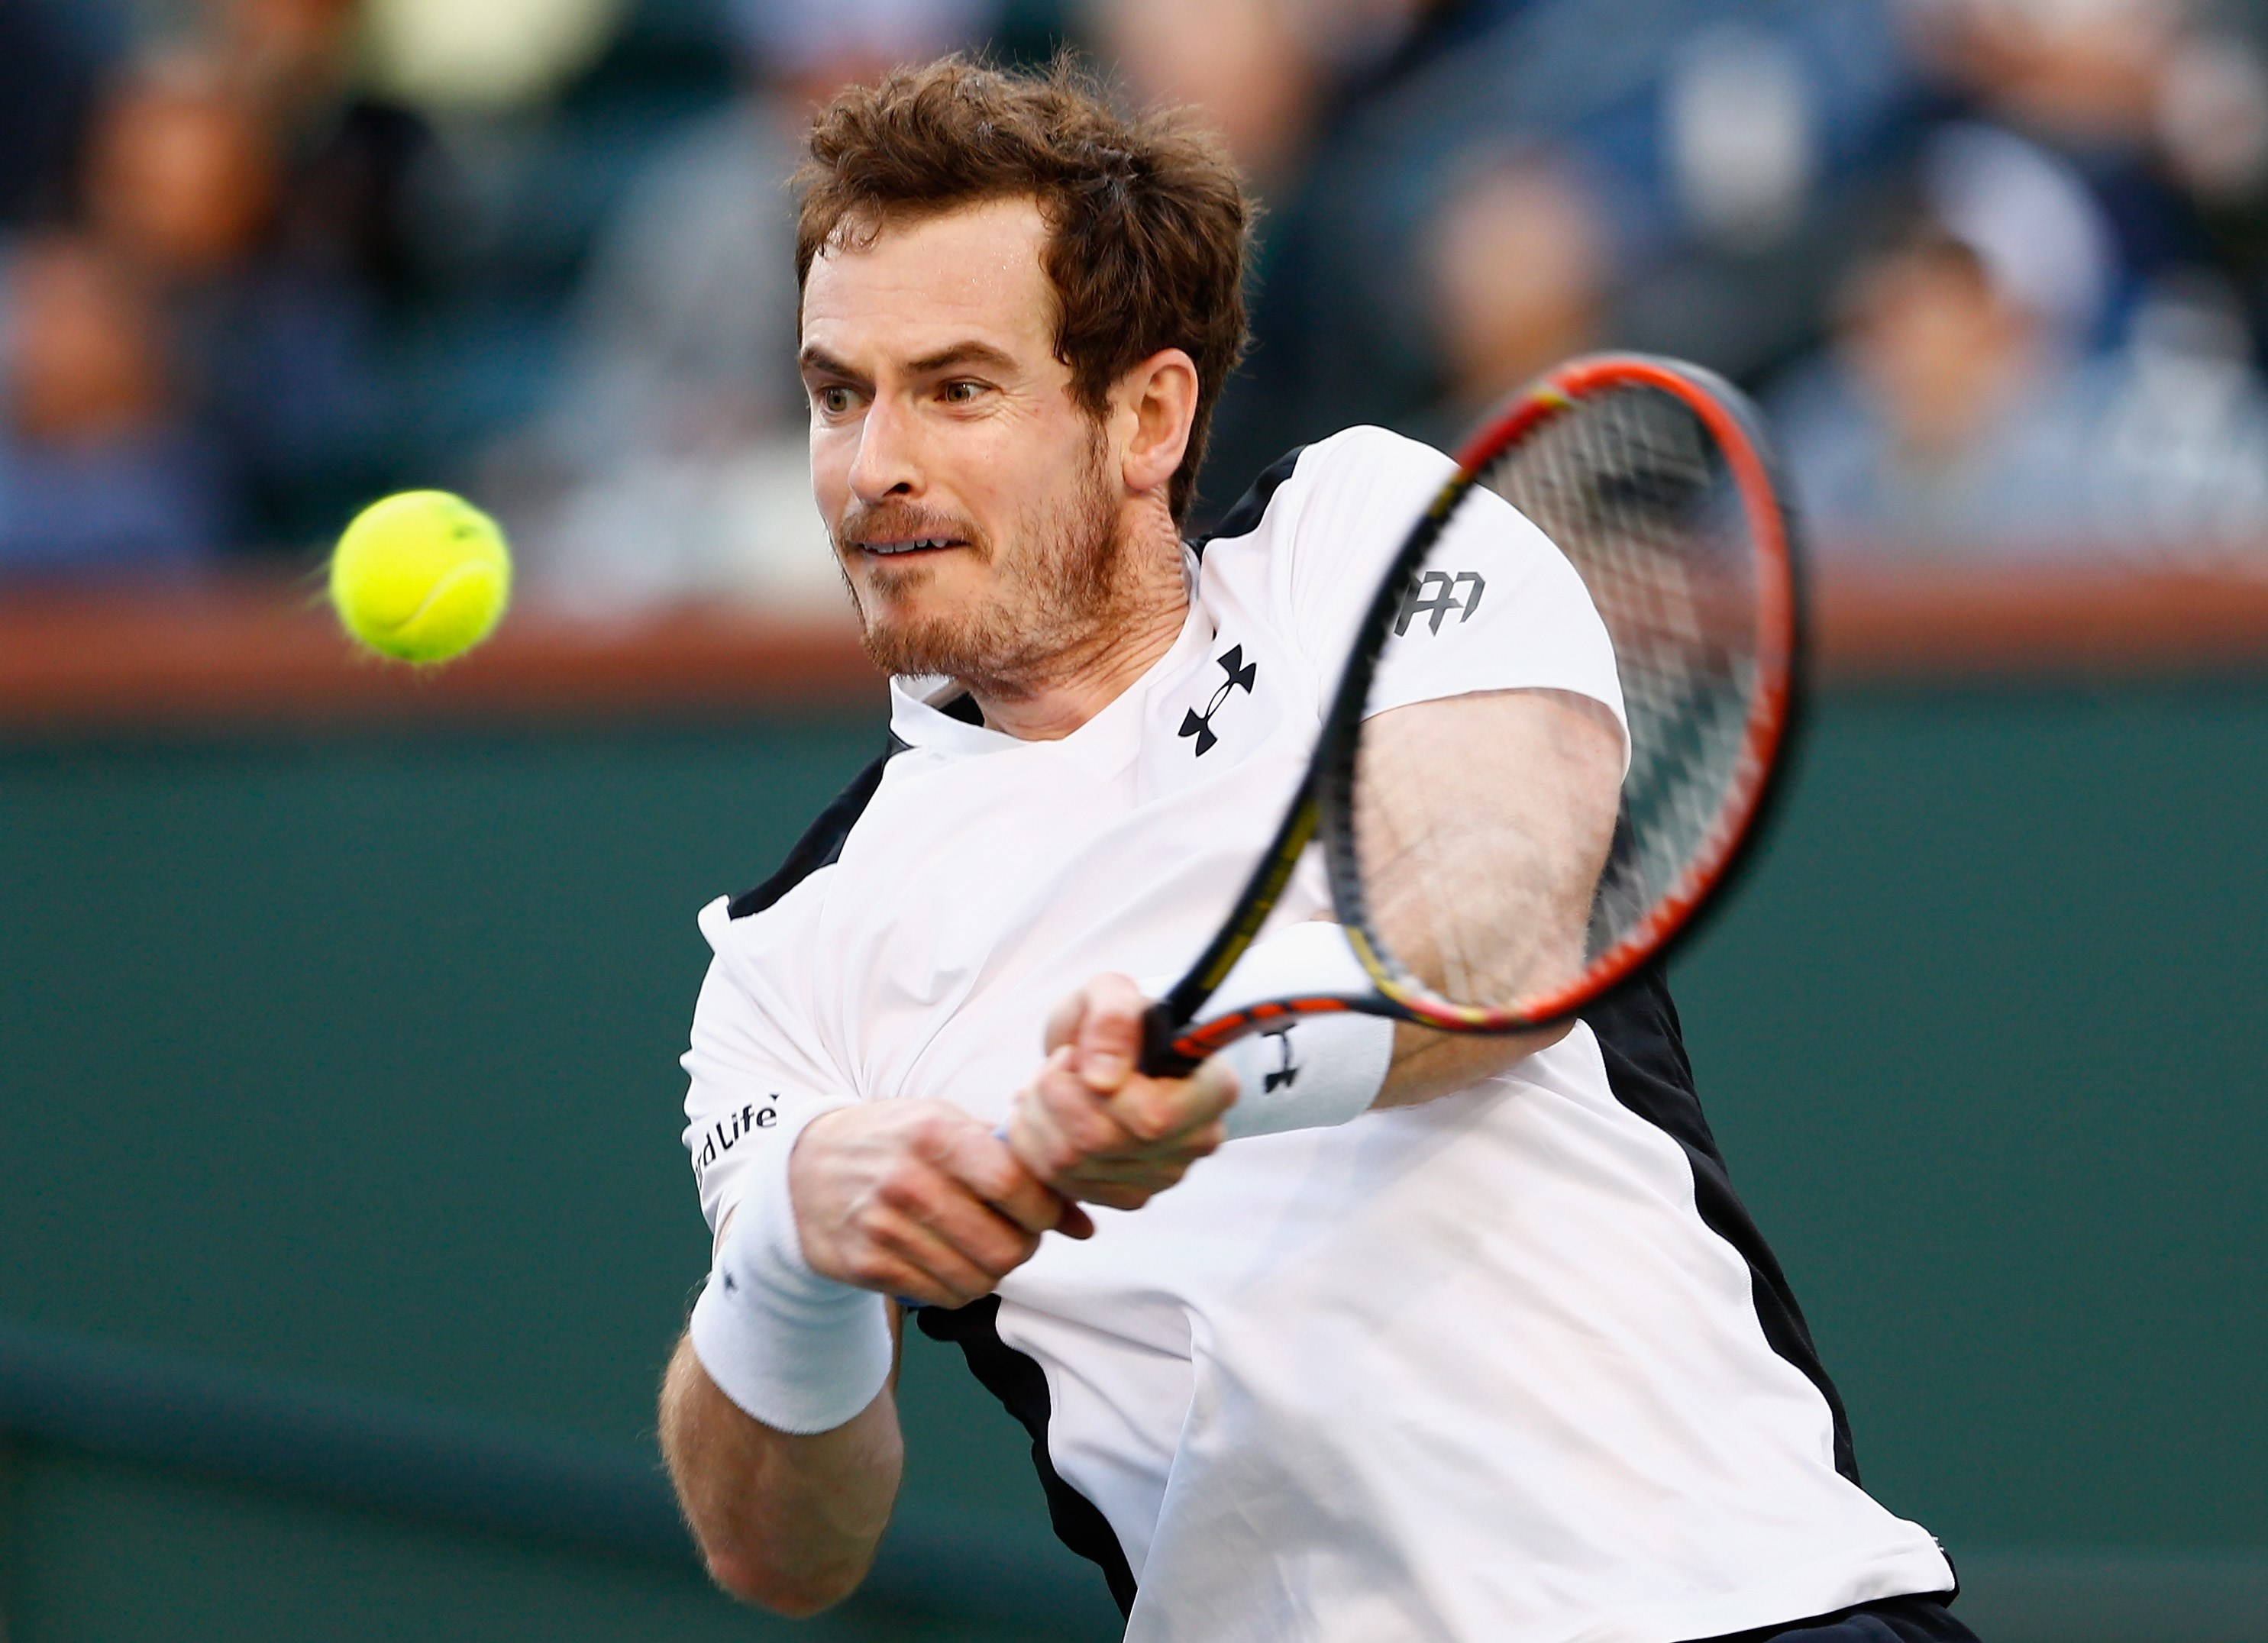 Murray advances, Kerber sent packing at Indian Wells